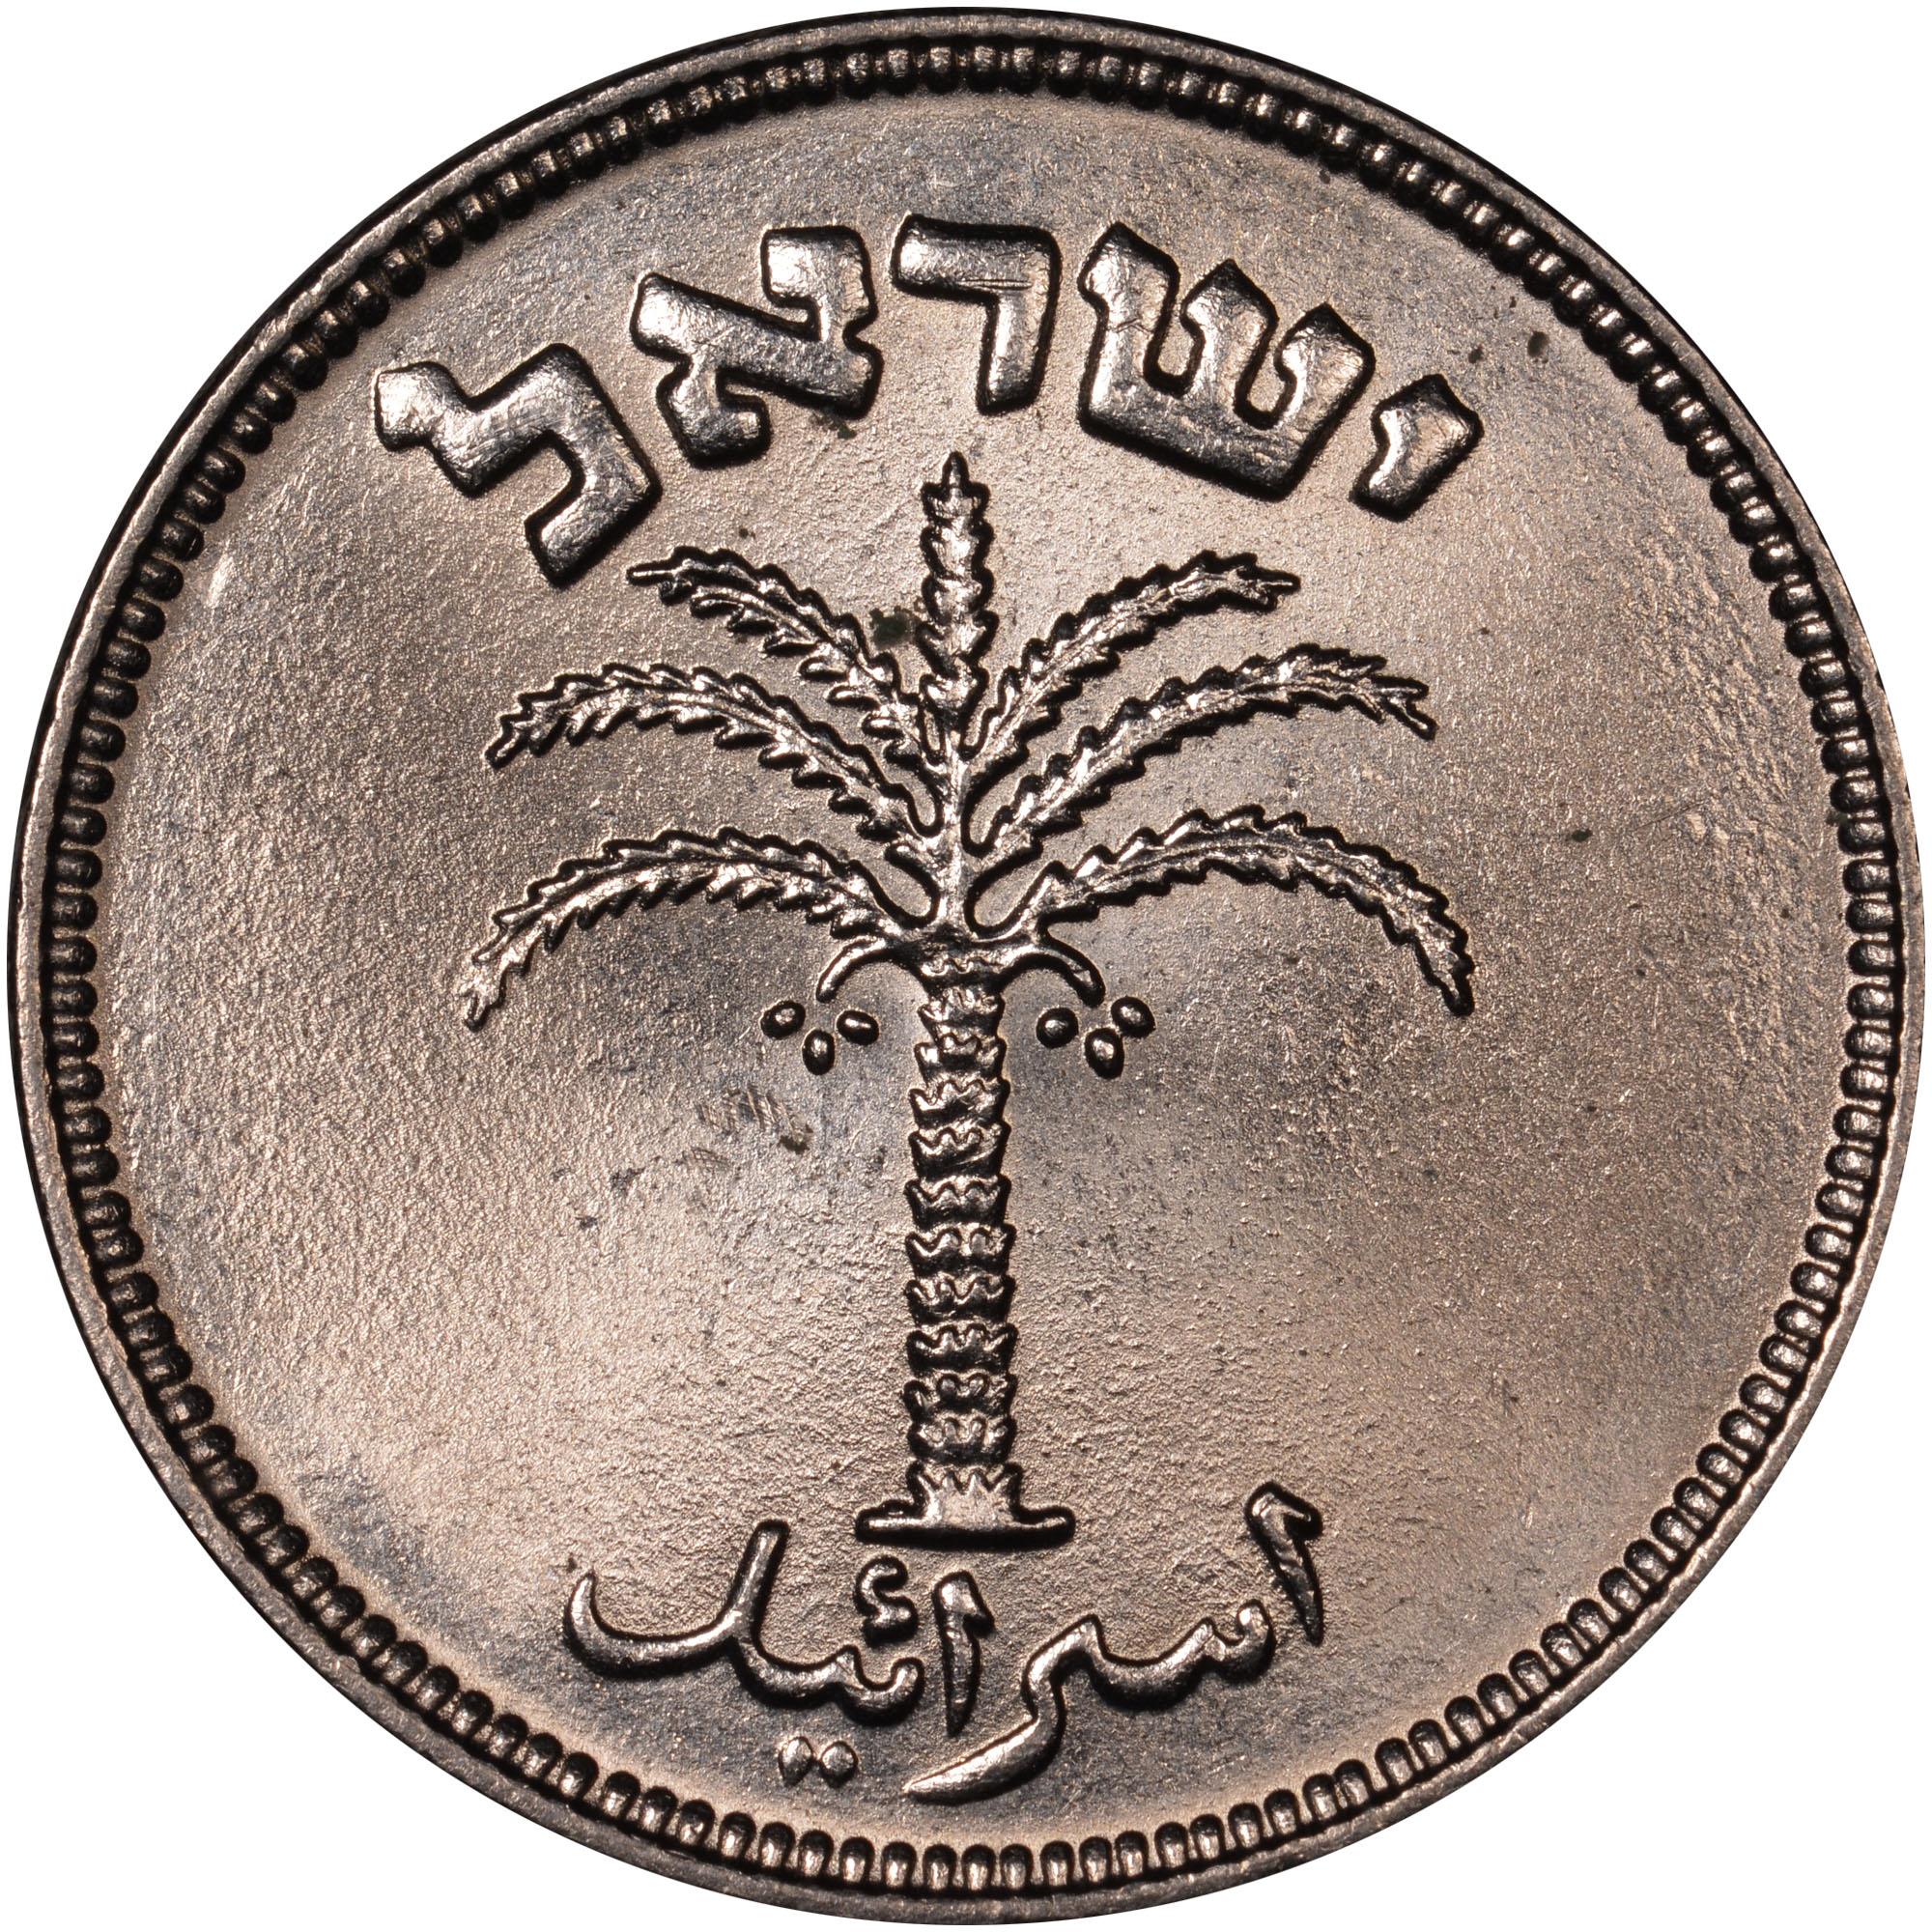 Israel 100 Pruta obverse